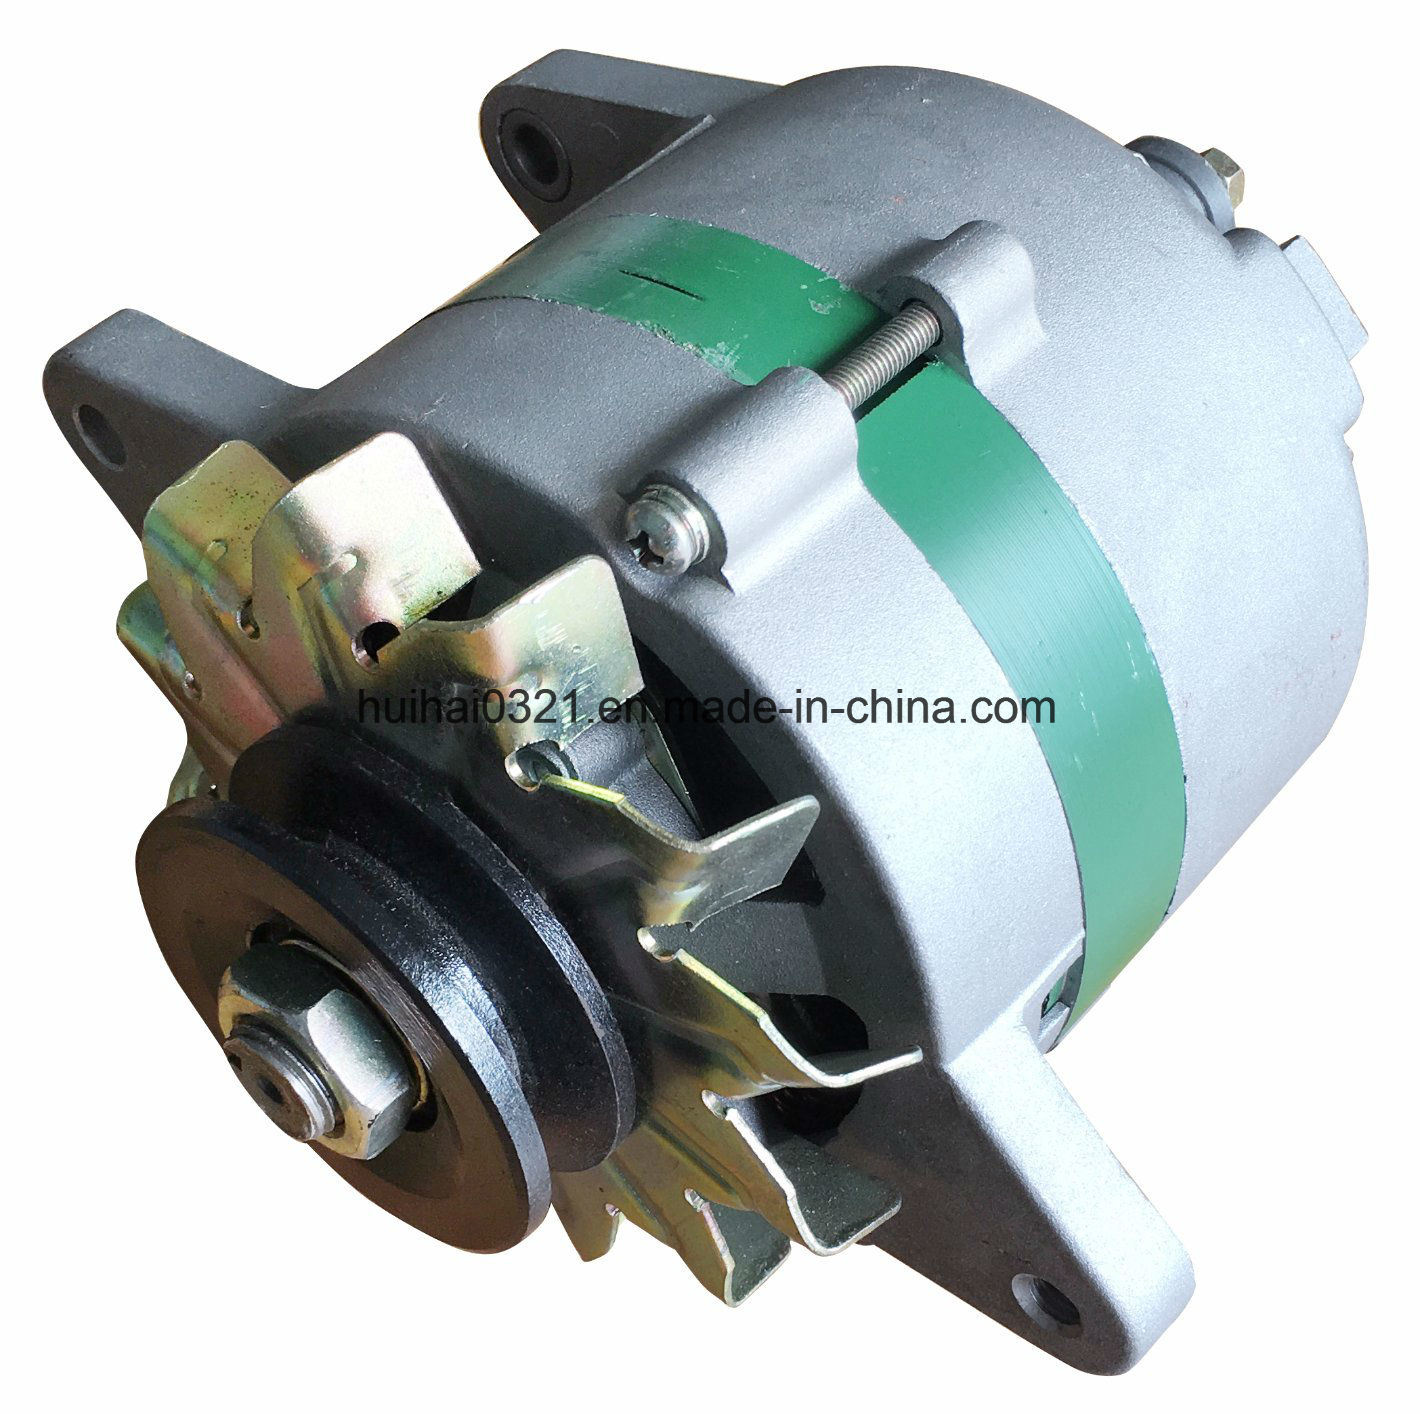 Auto Alternator for Suzuki, Daihatsu Engine 465, 12V 50A